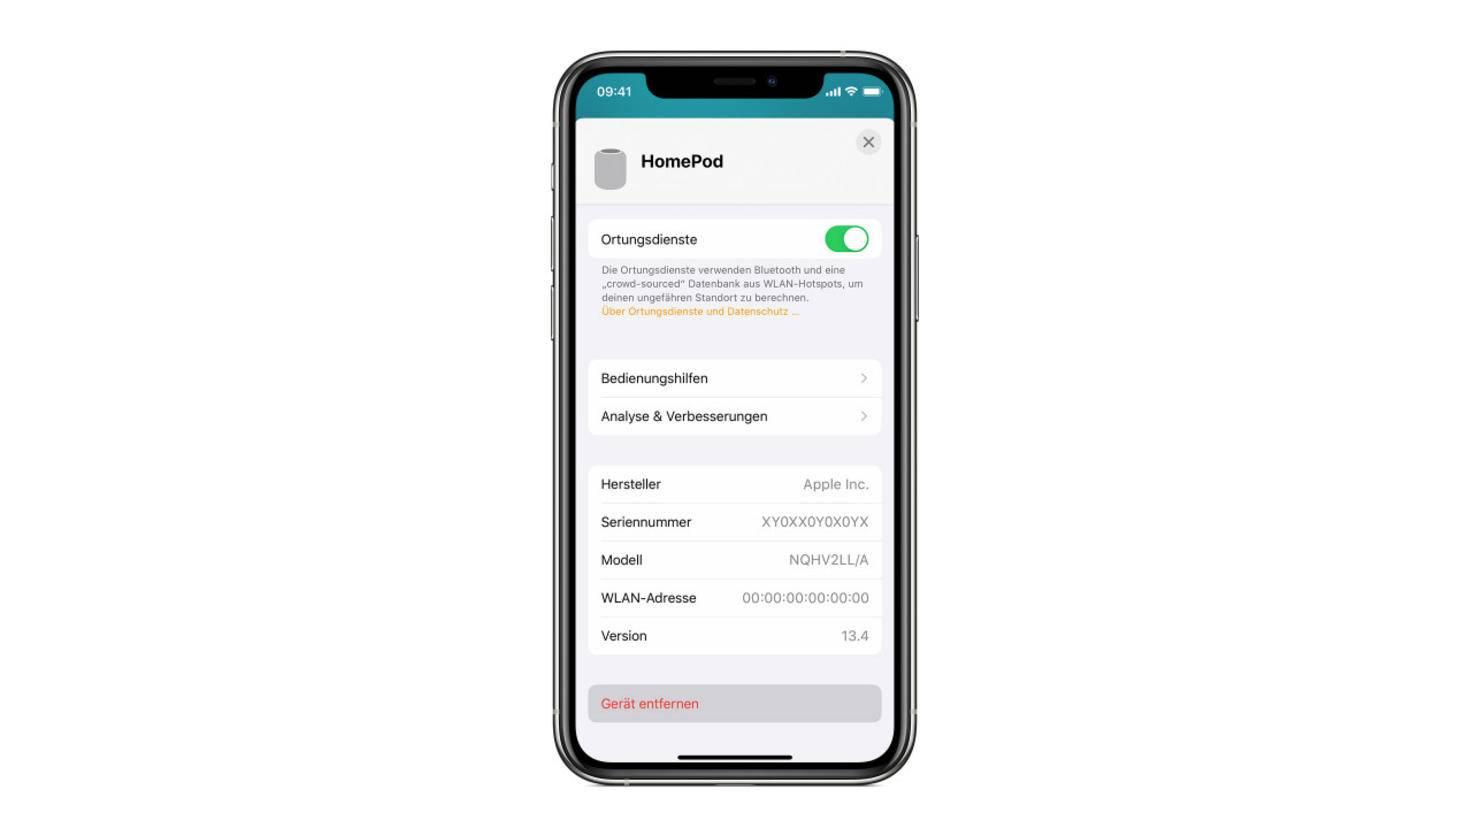 apple-homepod-reset-iphone-screenshot